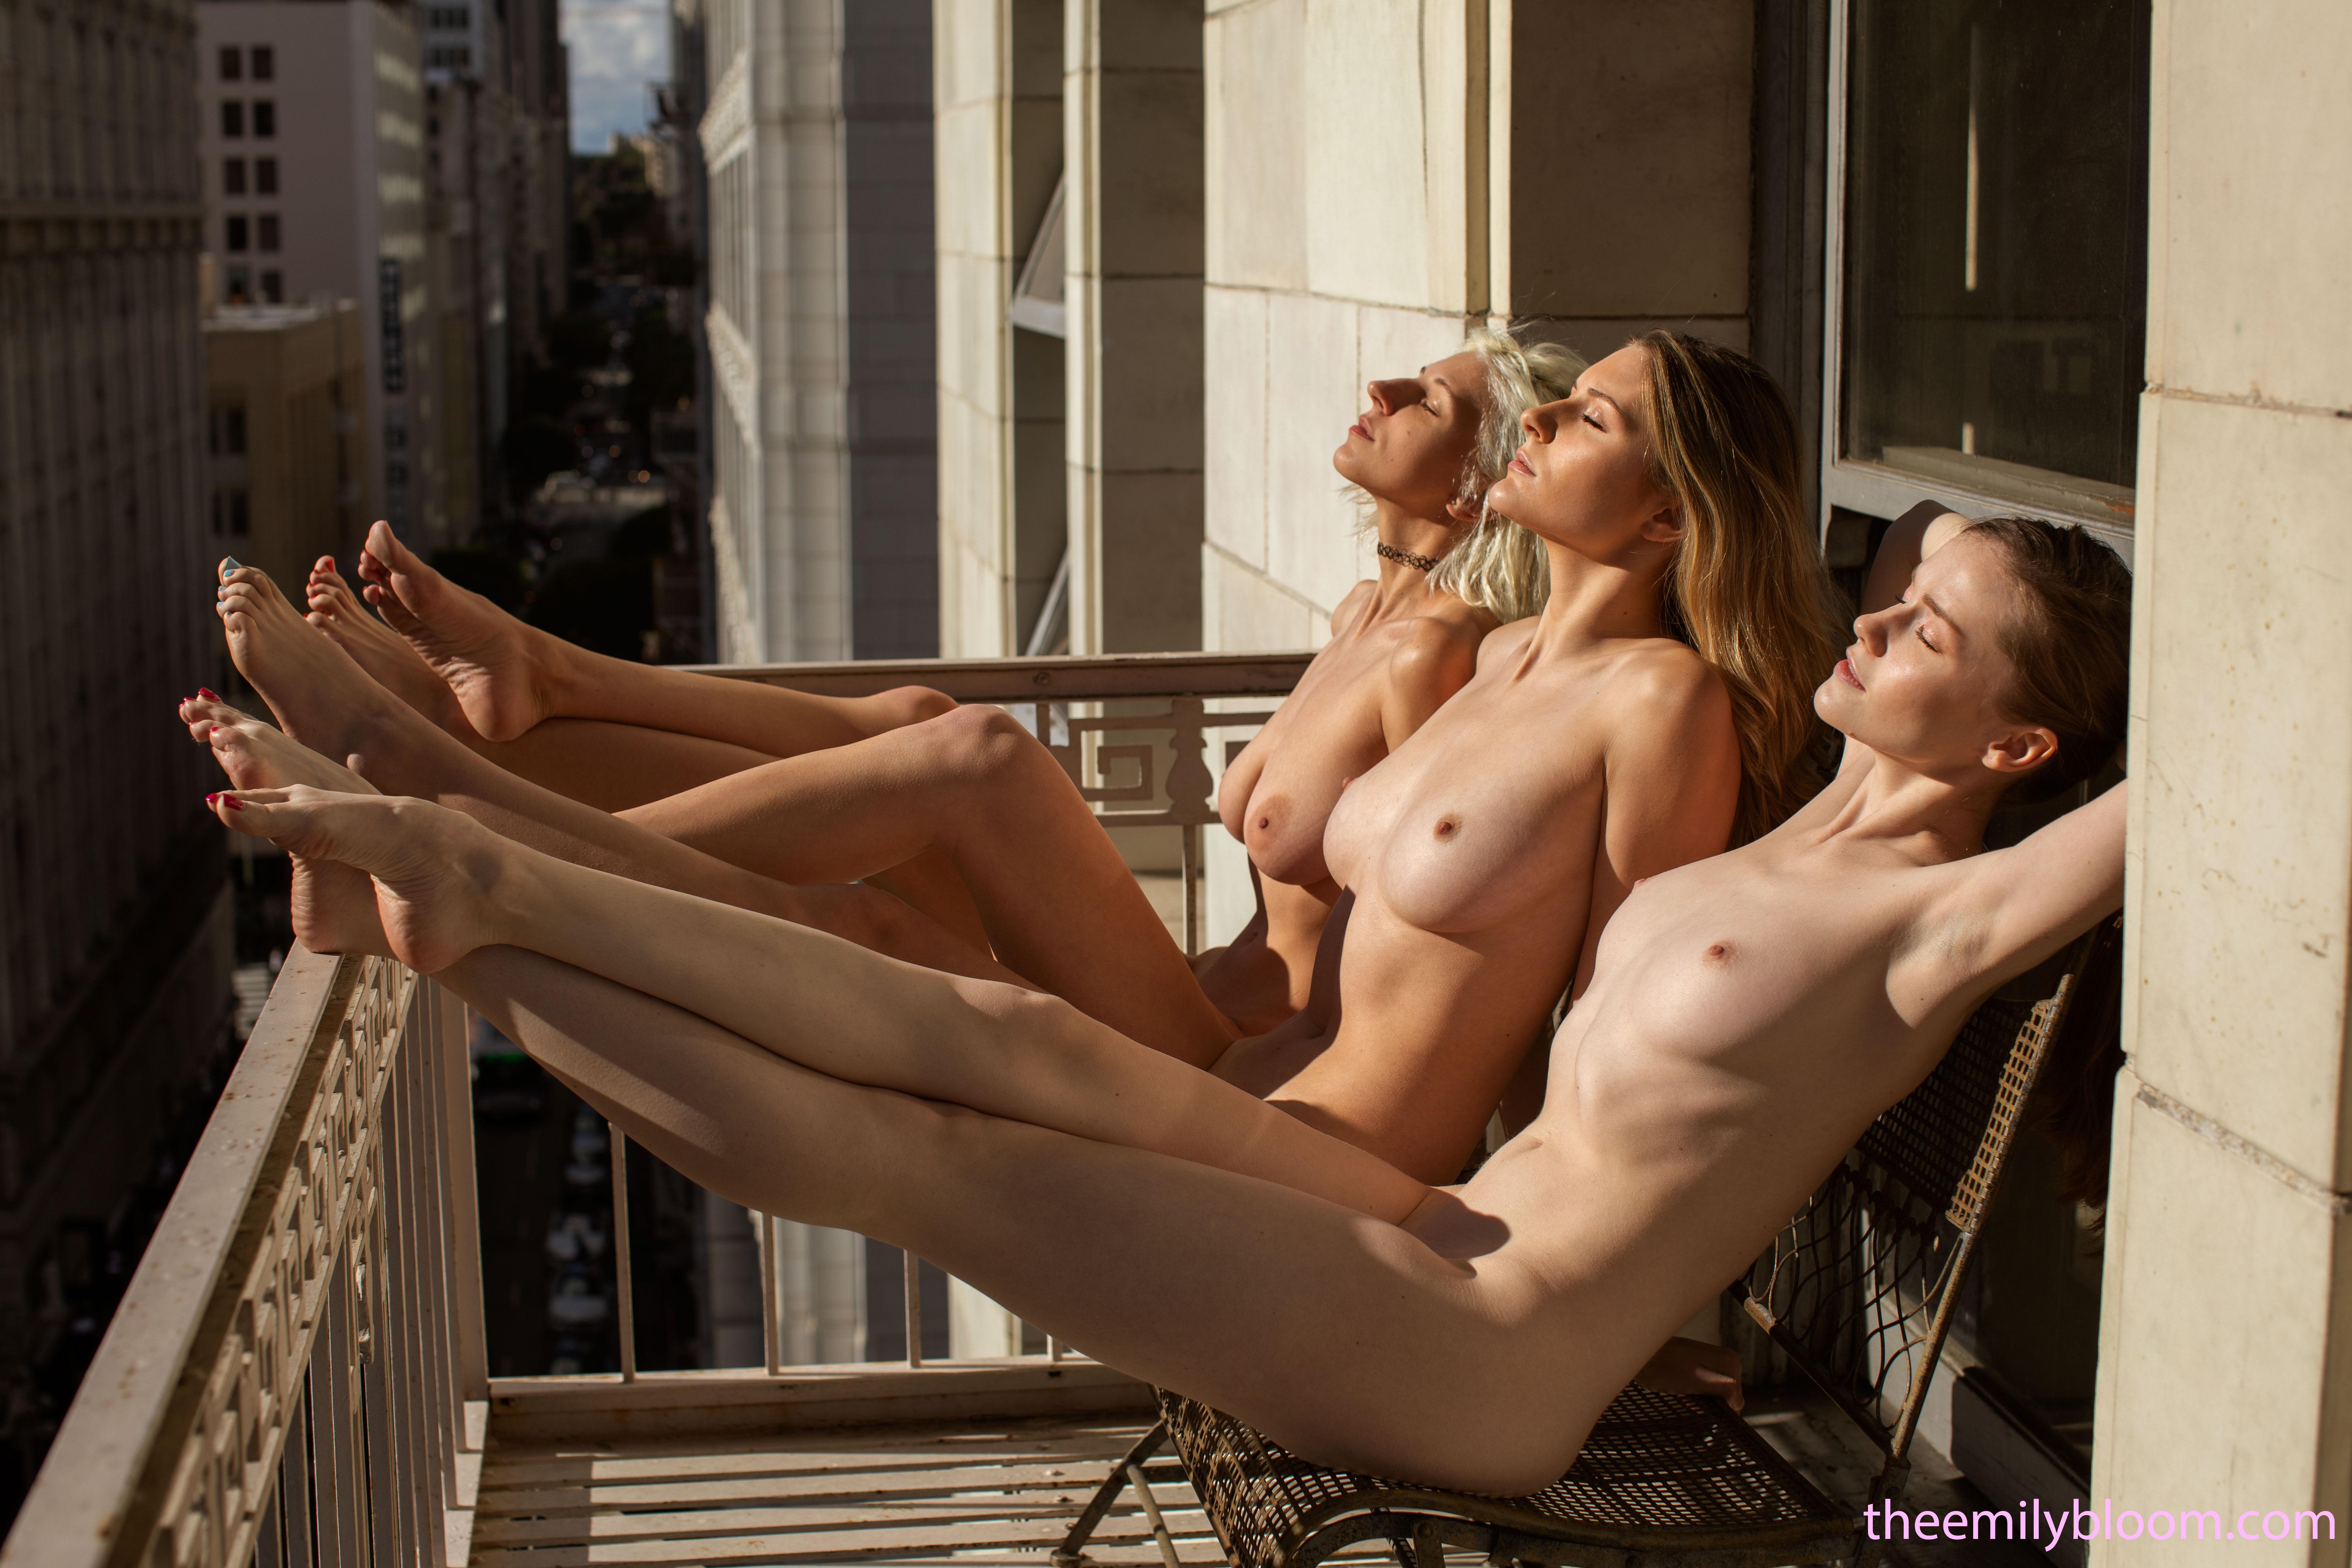 naked-trio-girls-photo-mix-lesbians-vol3-06